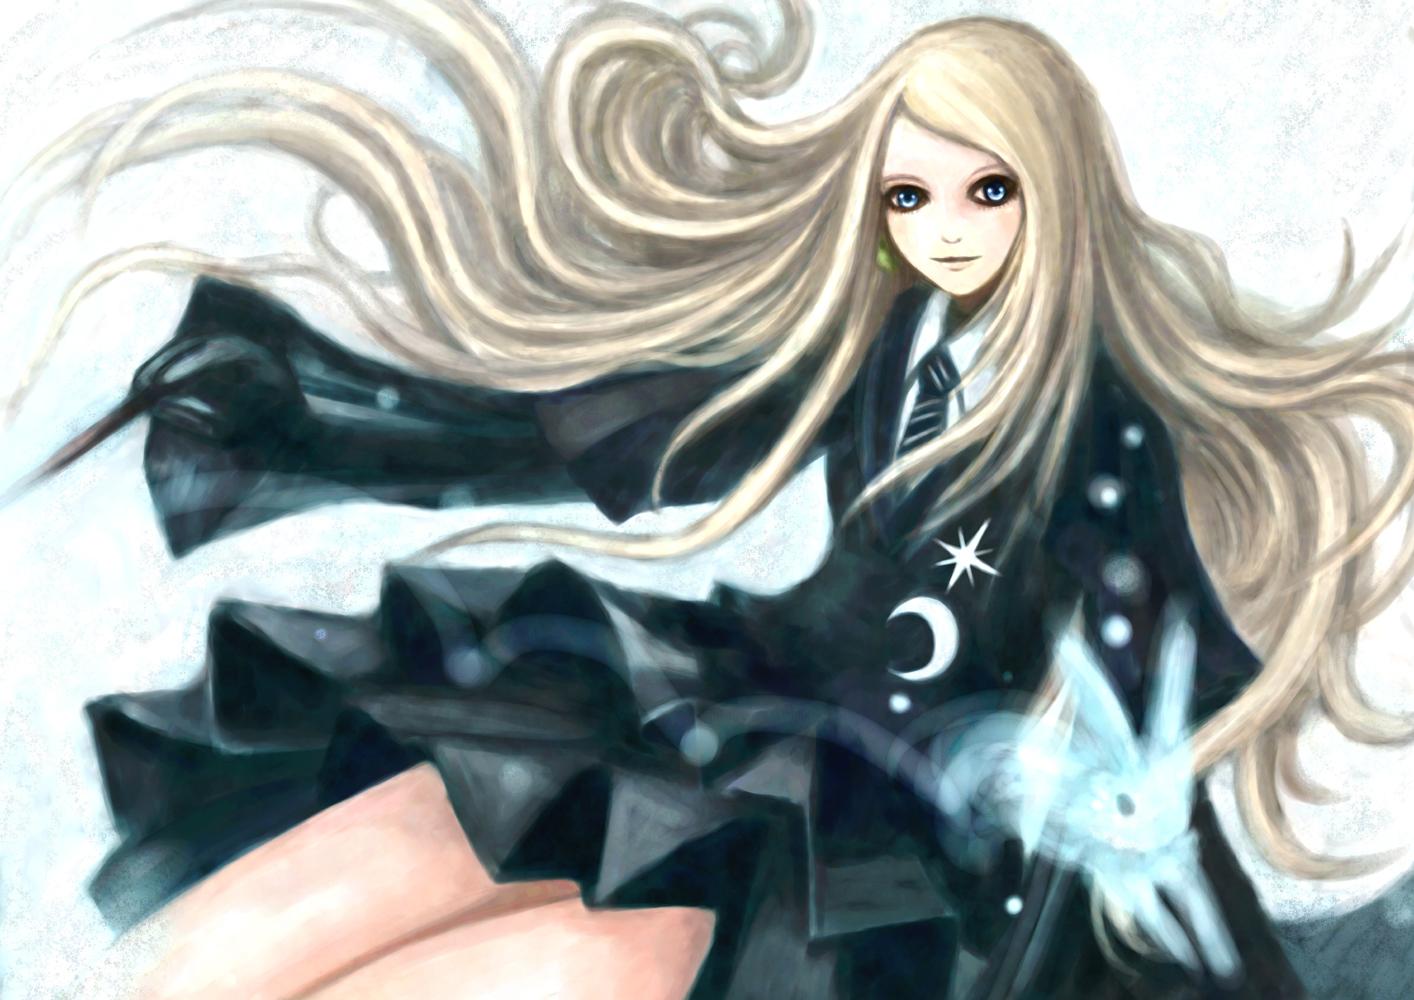 Aleksi Harry Potter Luna Lovegood - Luna Lovegood Harry Potter Ravenclaw Characters - HD Wallpaper